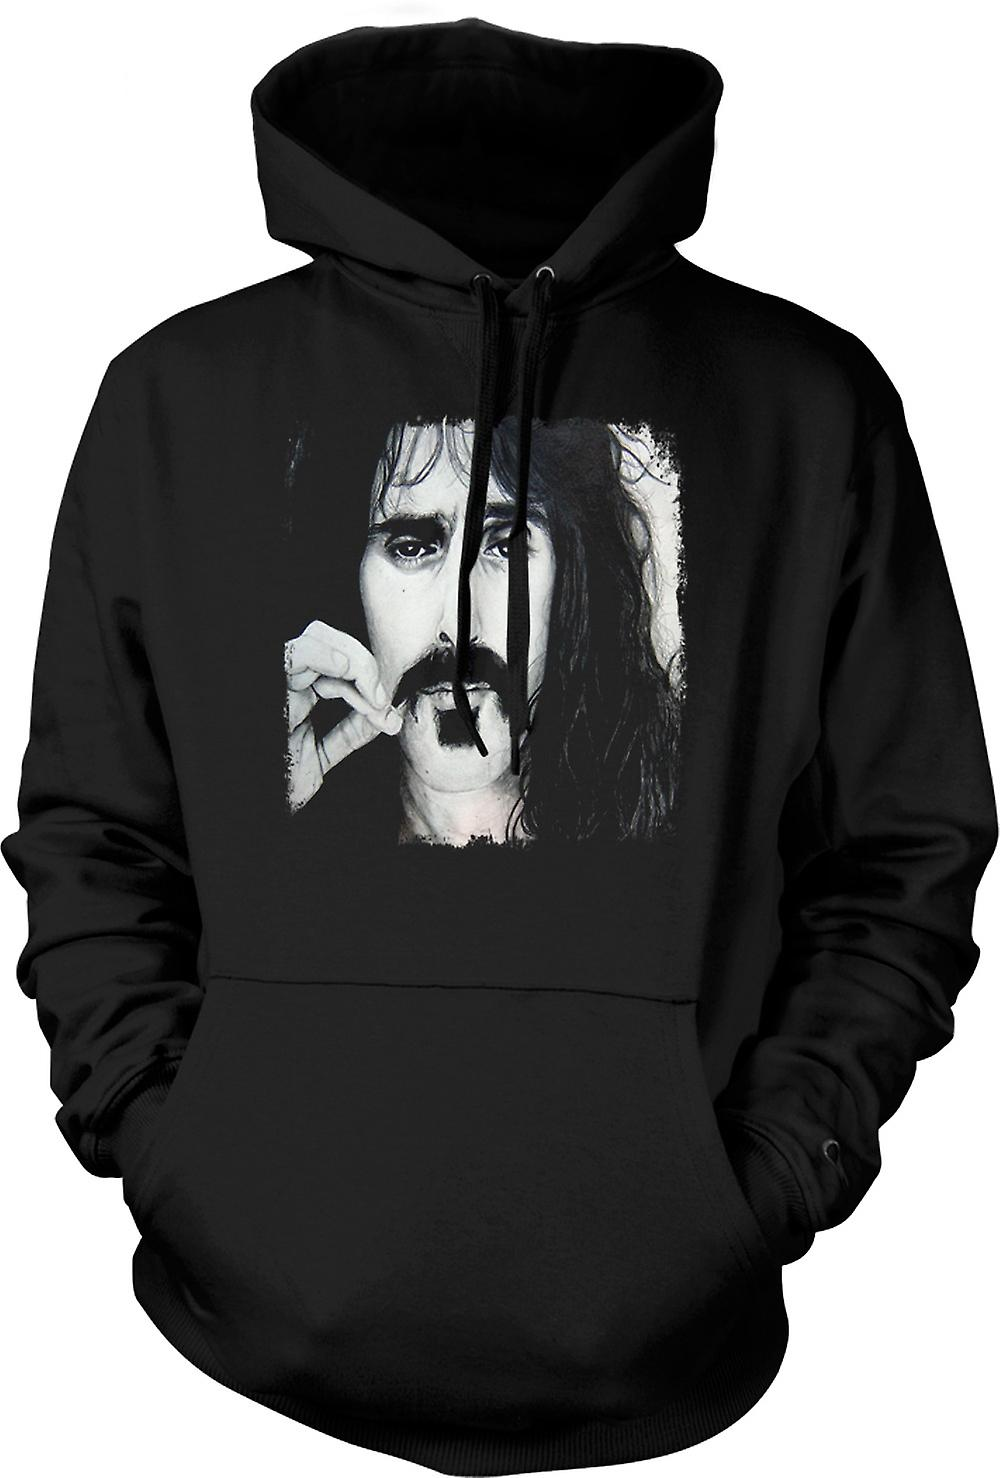 Enfant Sweat Capuche - Frank Zappa - Portrait Sketch